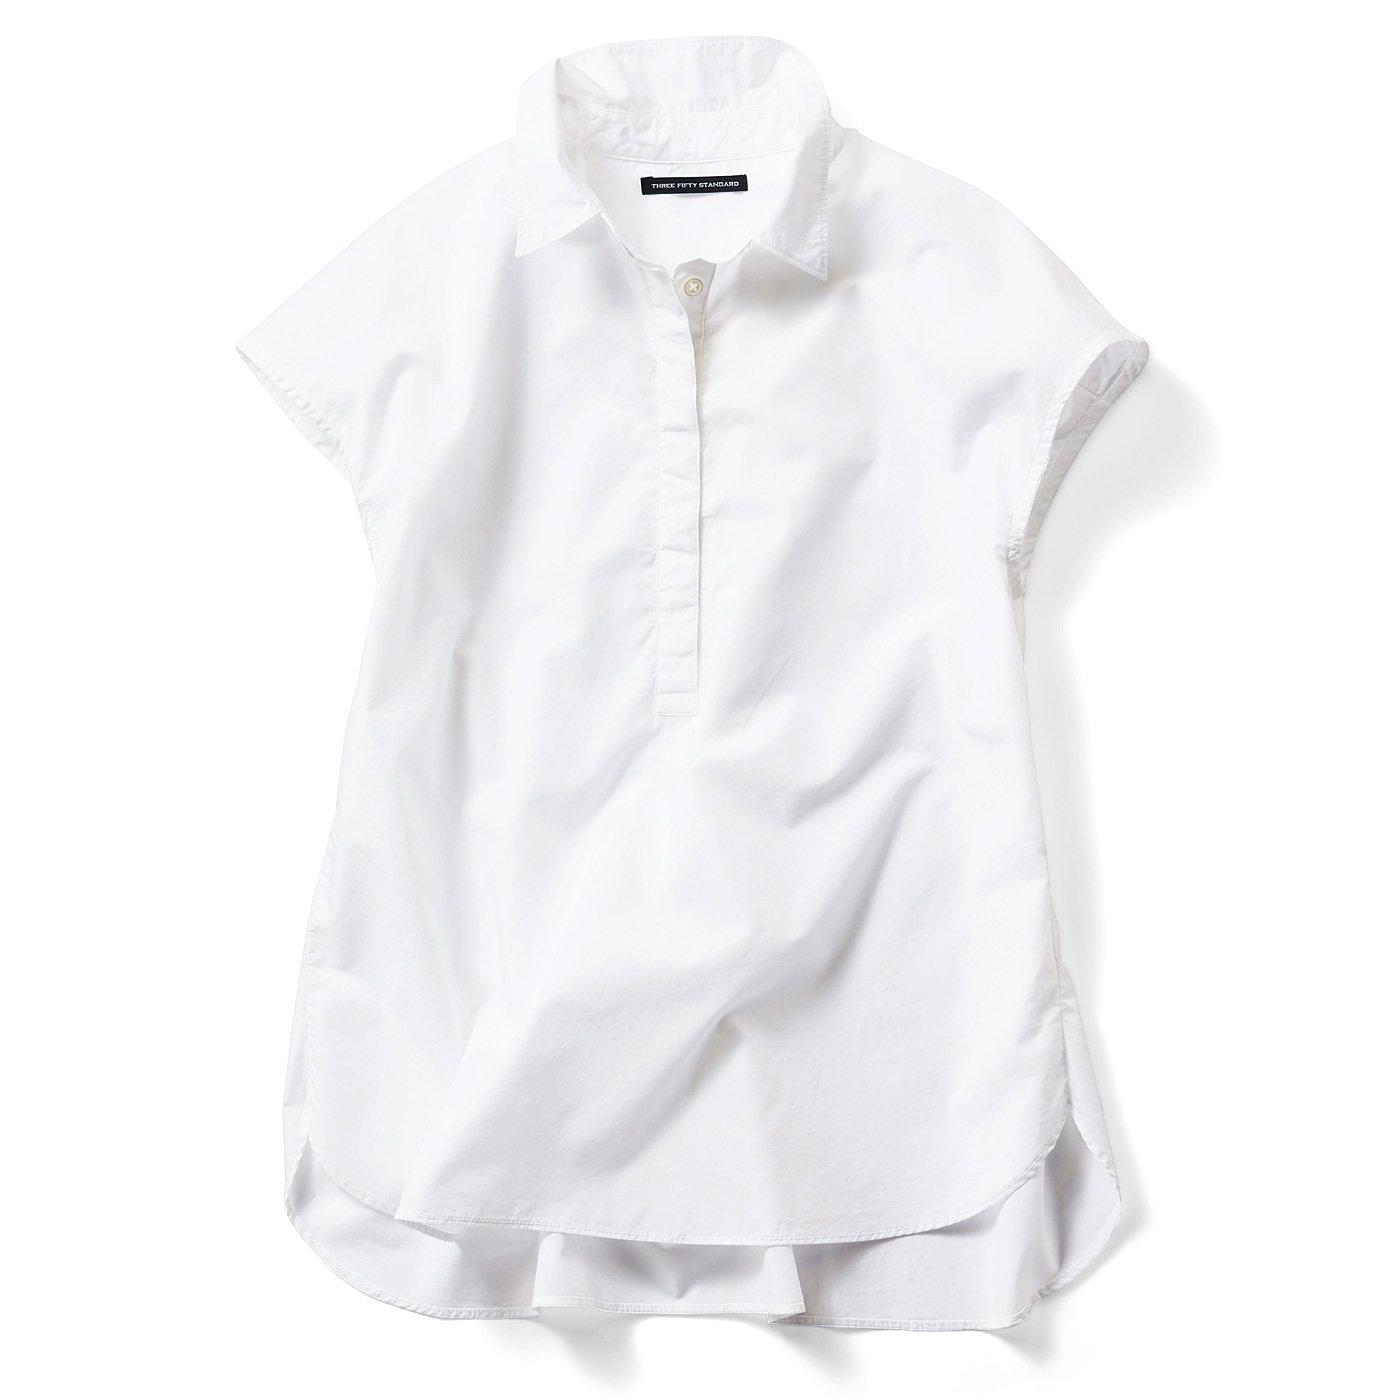 THREE FIFTY STANDARD 比翼のフレンチスリーブシャツ〈ホワイト〉